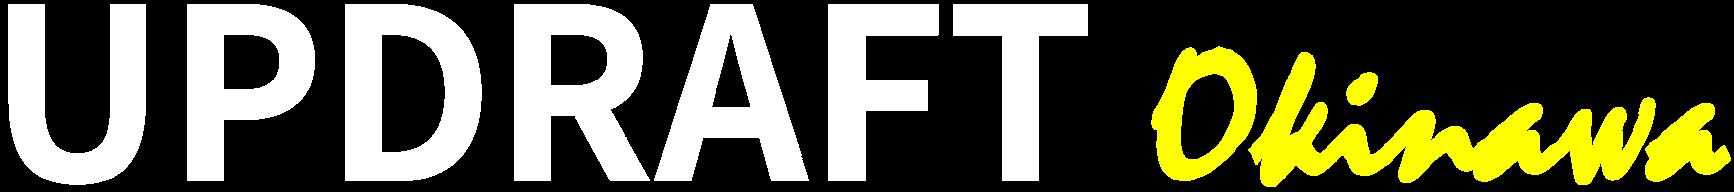 UPDRAFT Reha 沖縄 | 理学療法士・勉強会・求人・転職・知識・副業情報メディア【アップドラフト】